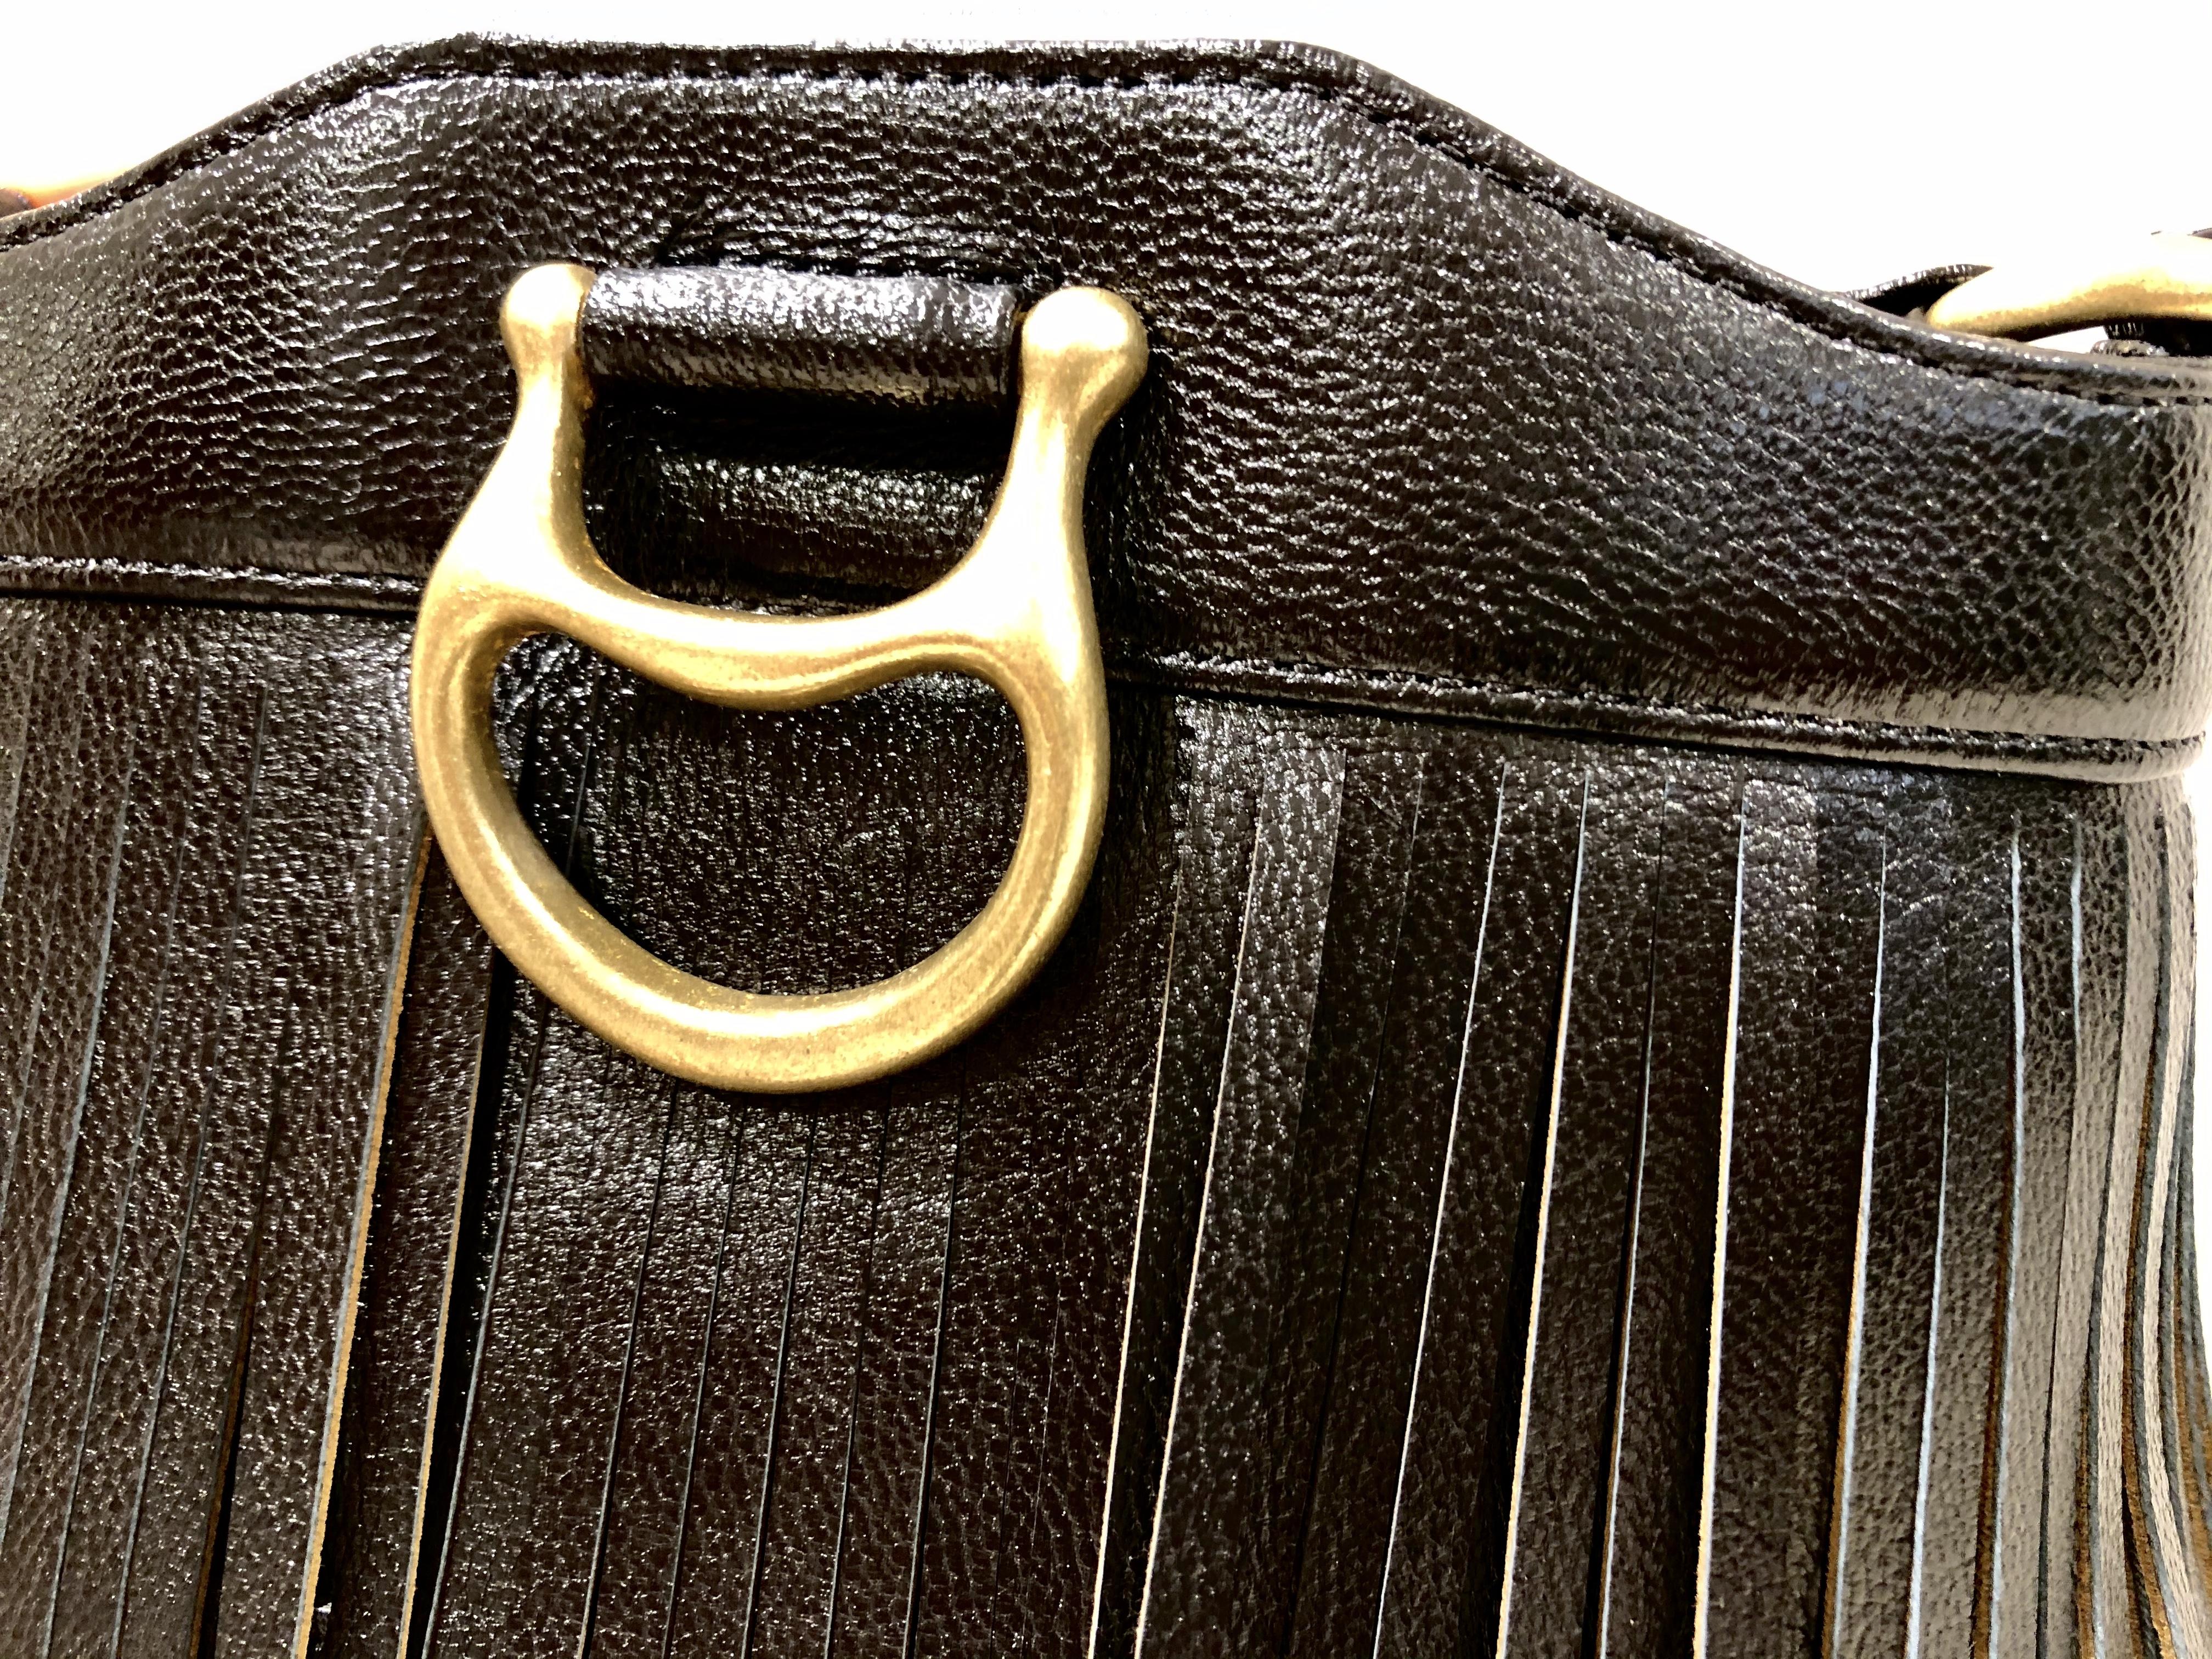 TOFF & LOADSTONE トフ ScrapBook スクラップブック 山羊皮 ショルダーバッグ shoulderbag フリンジ 真鍮 ルミネ大宮 大宮ルミネ